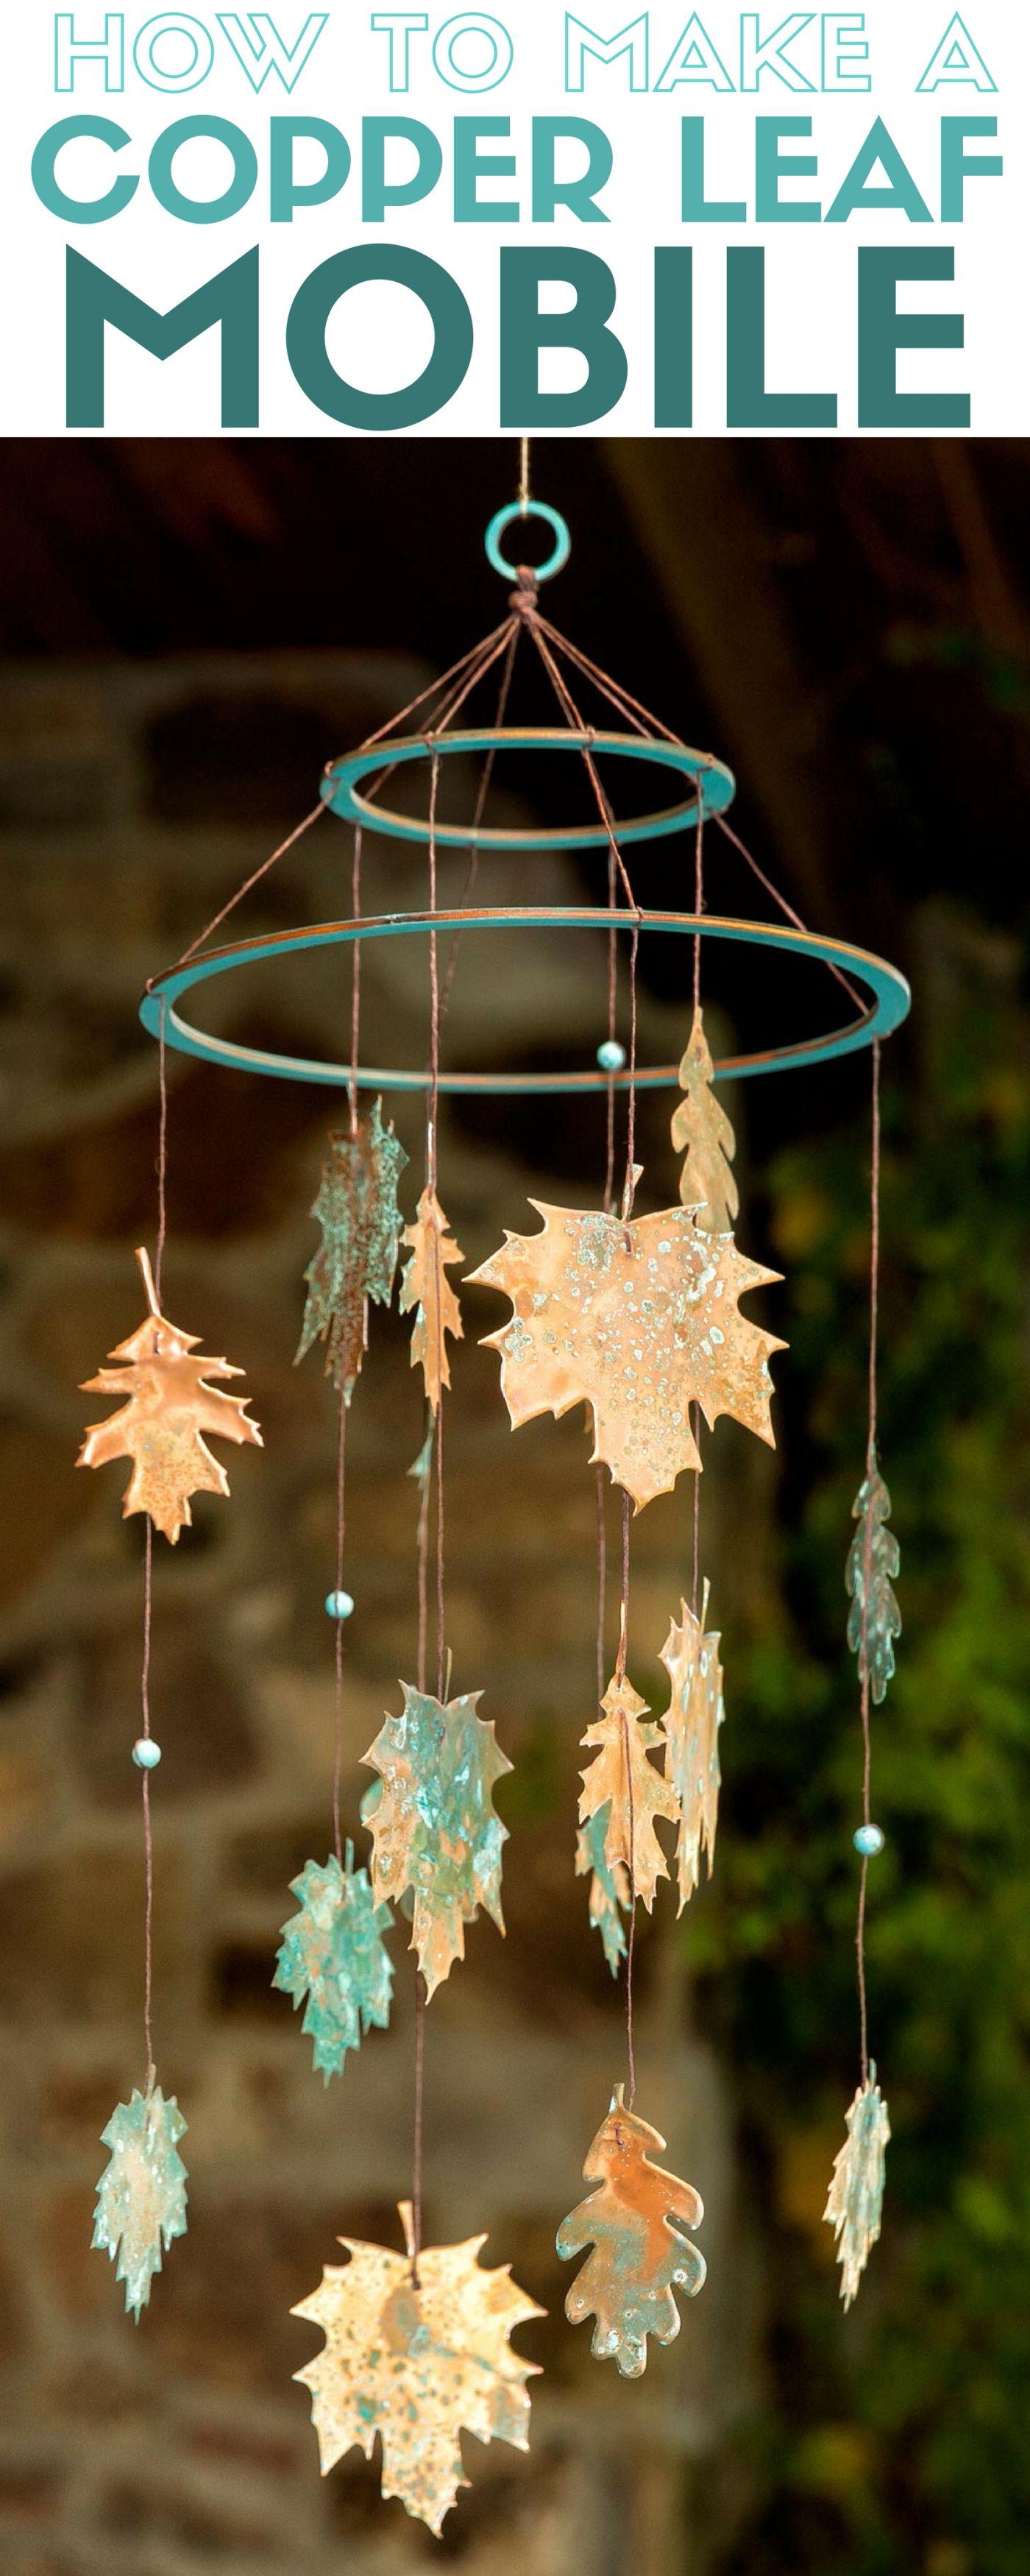 How To Make A Diy Copper Leaf Mobile Craft Ideas Diy Crafts